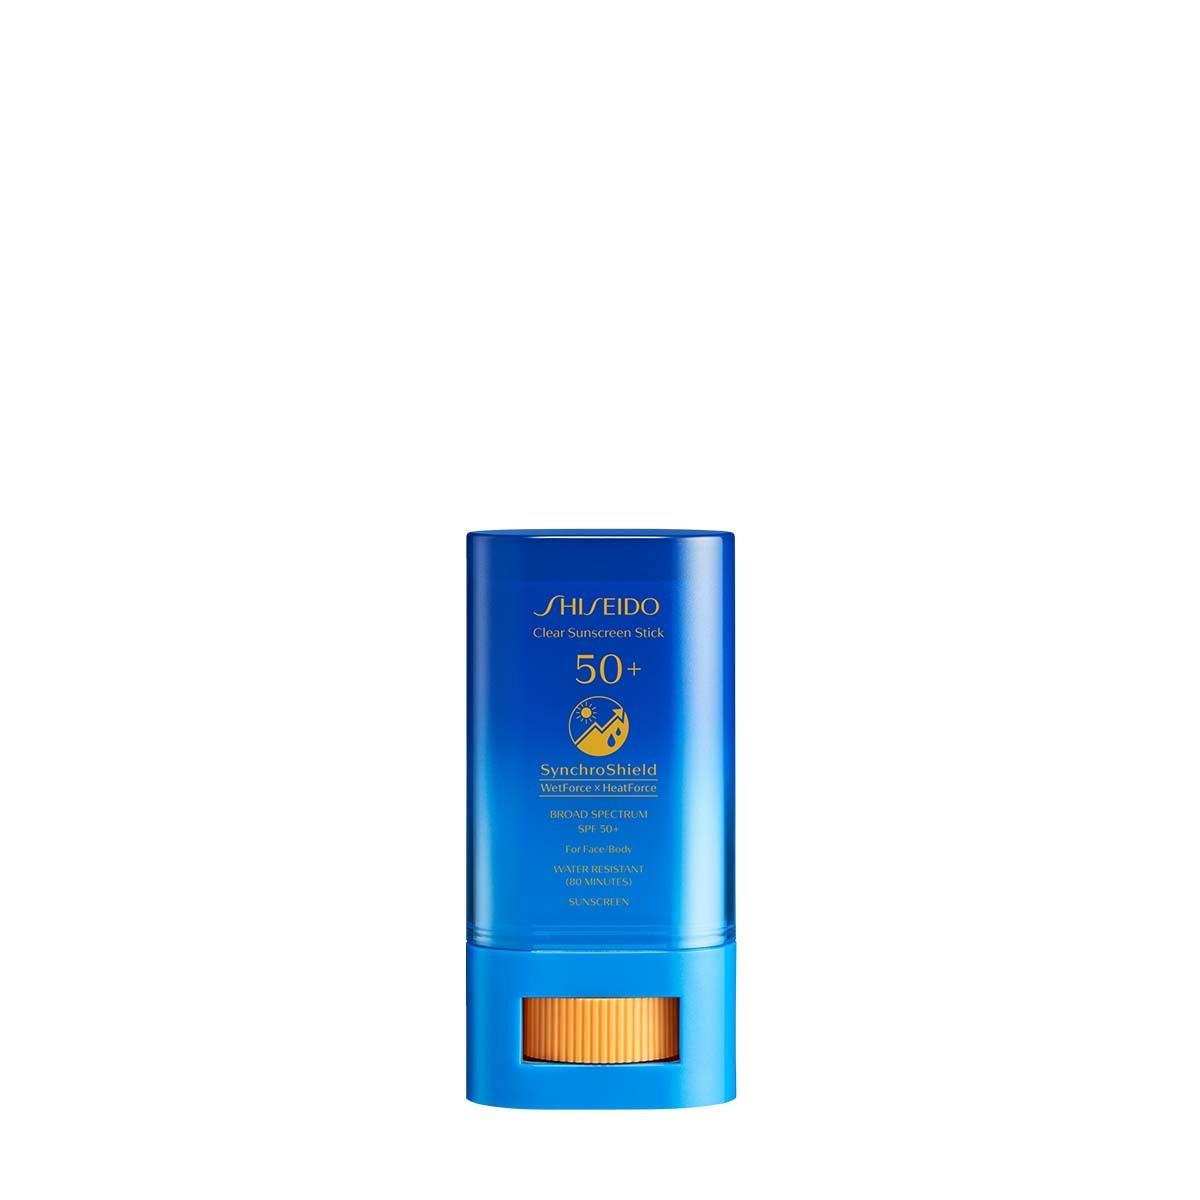 CLEAR SUNCARE SCREEN STICK SPF 50+ (PROTECTOR SOLAR)